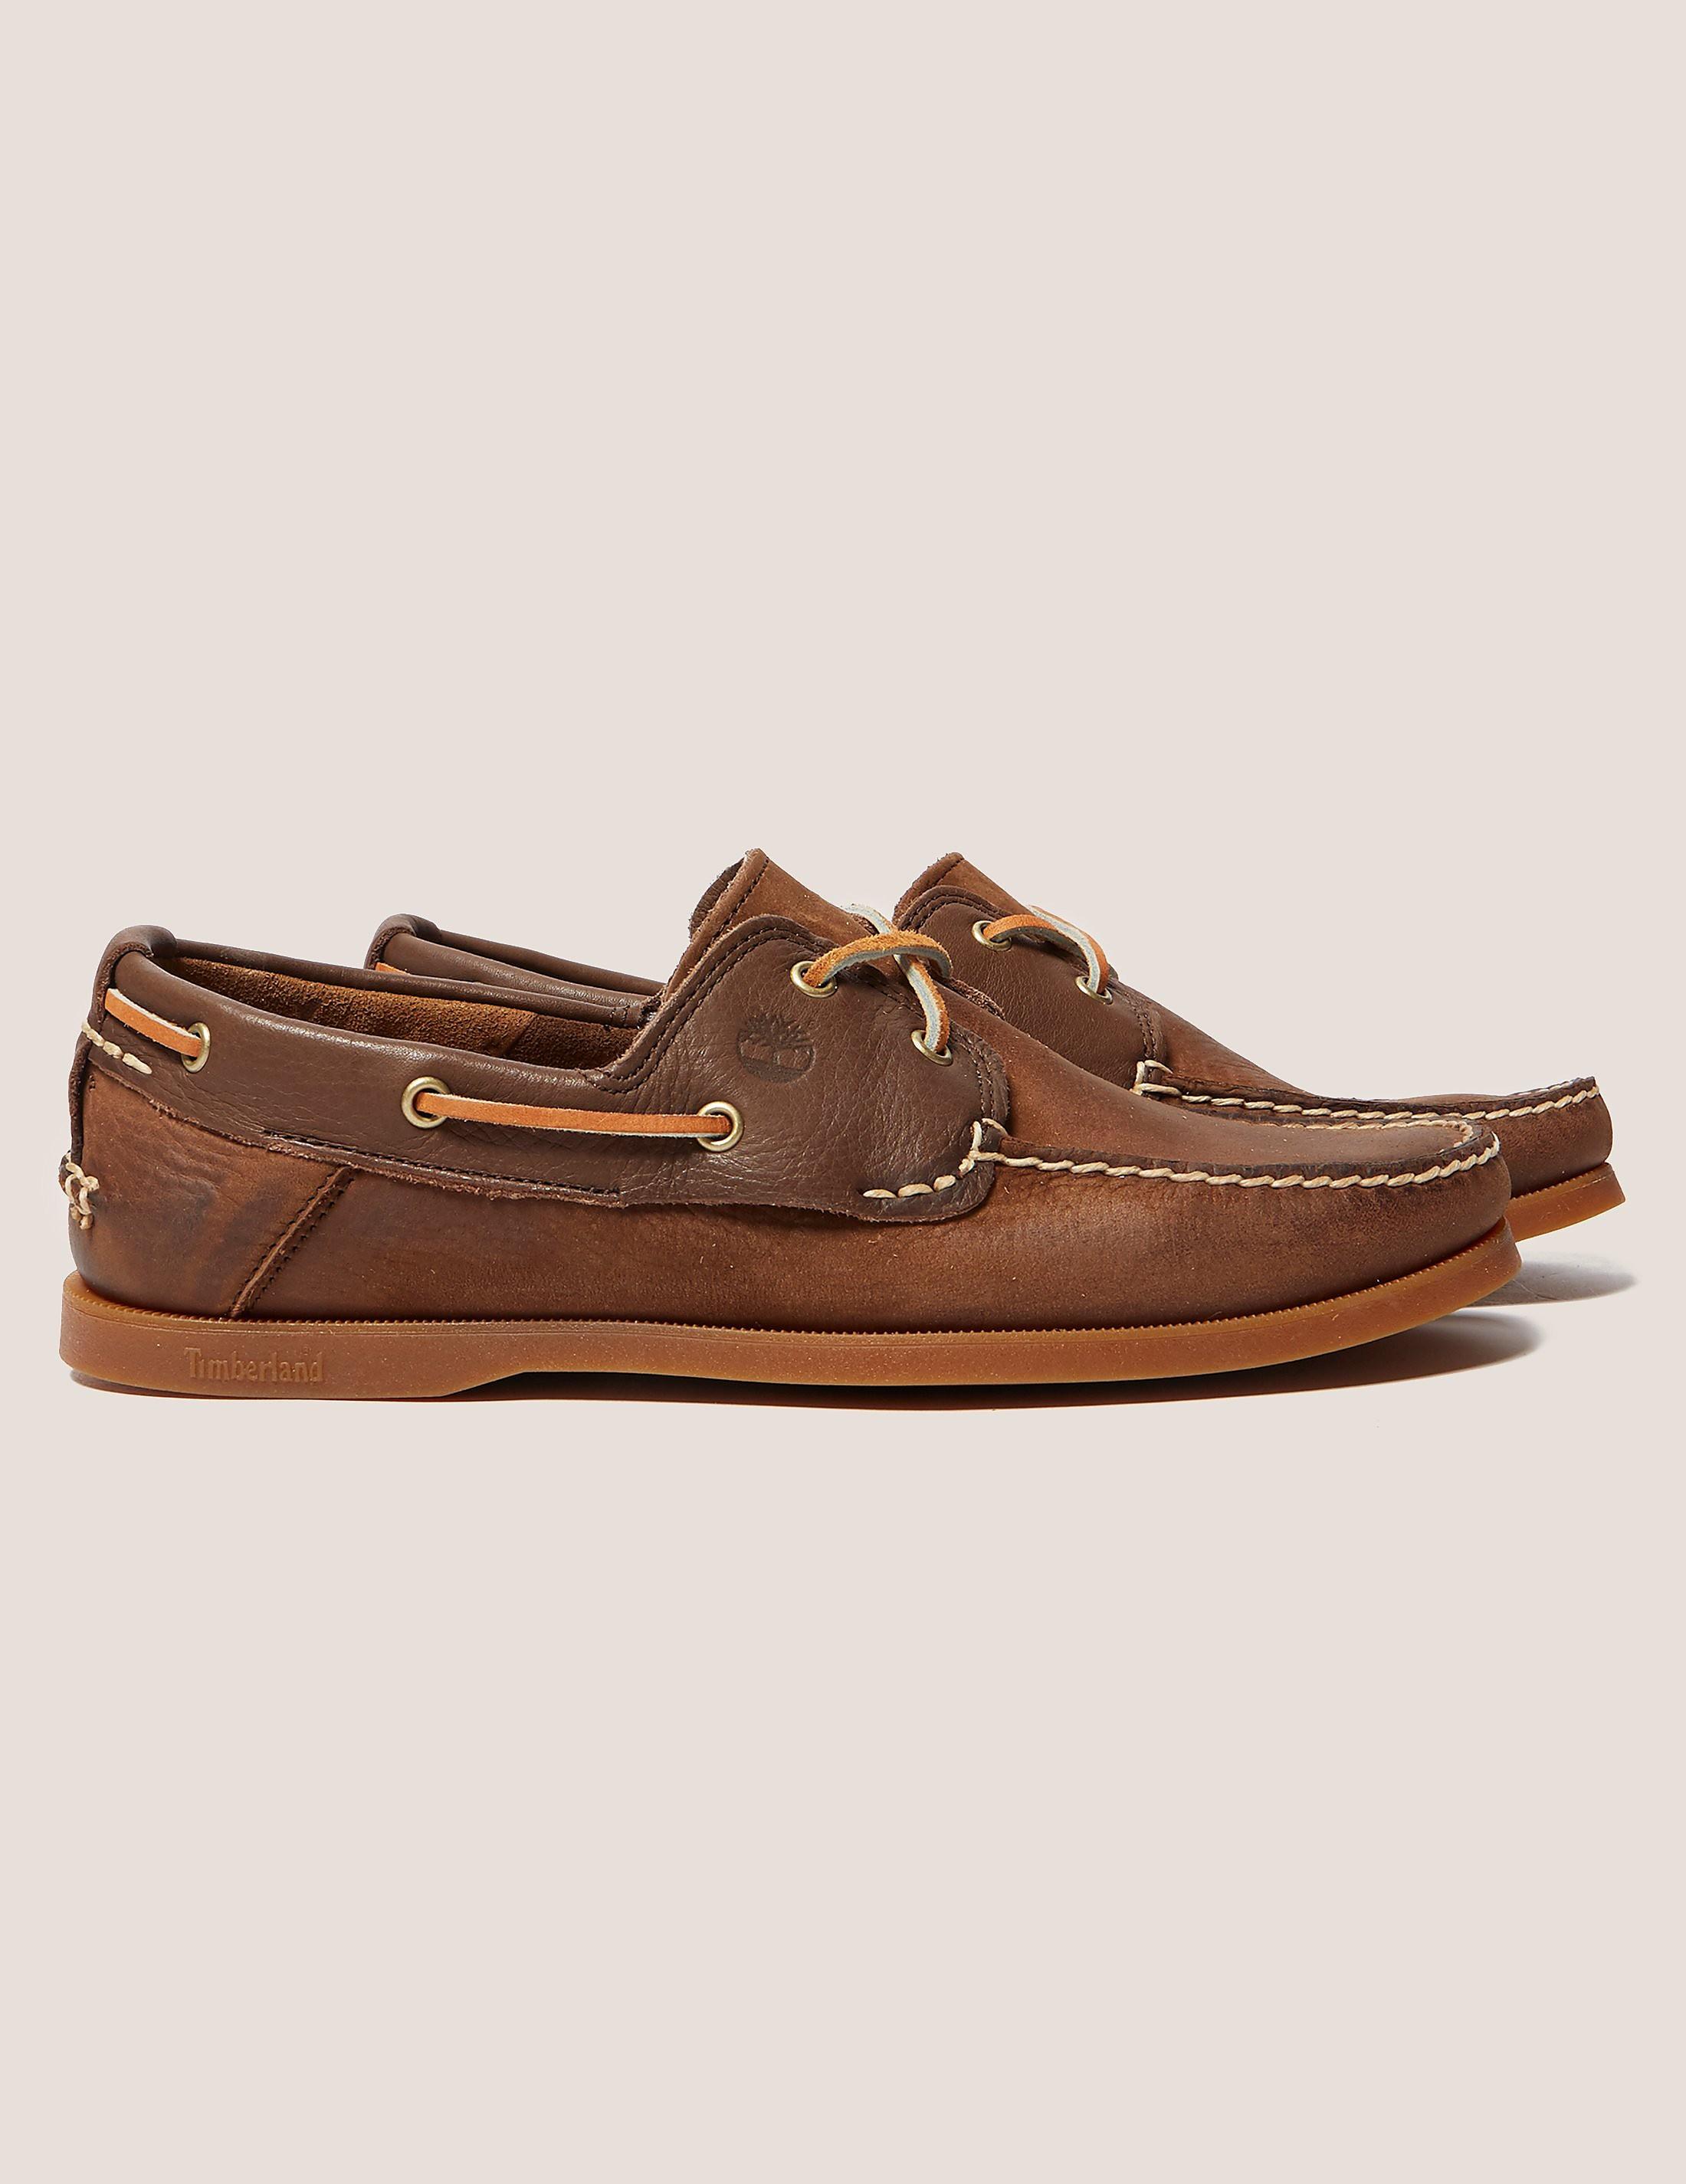 Timberland 2-Eye Boat Shoe